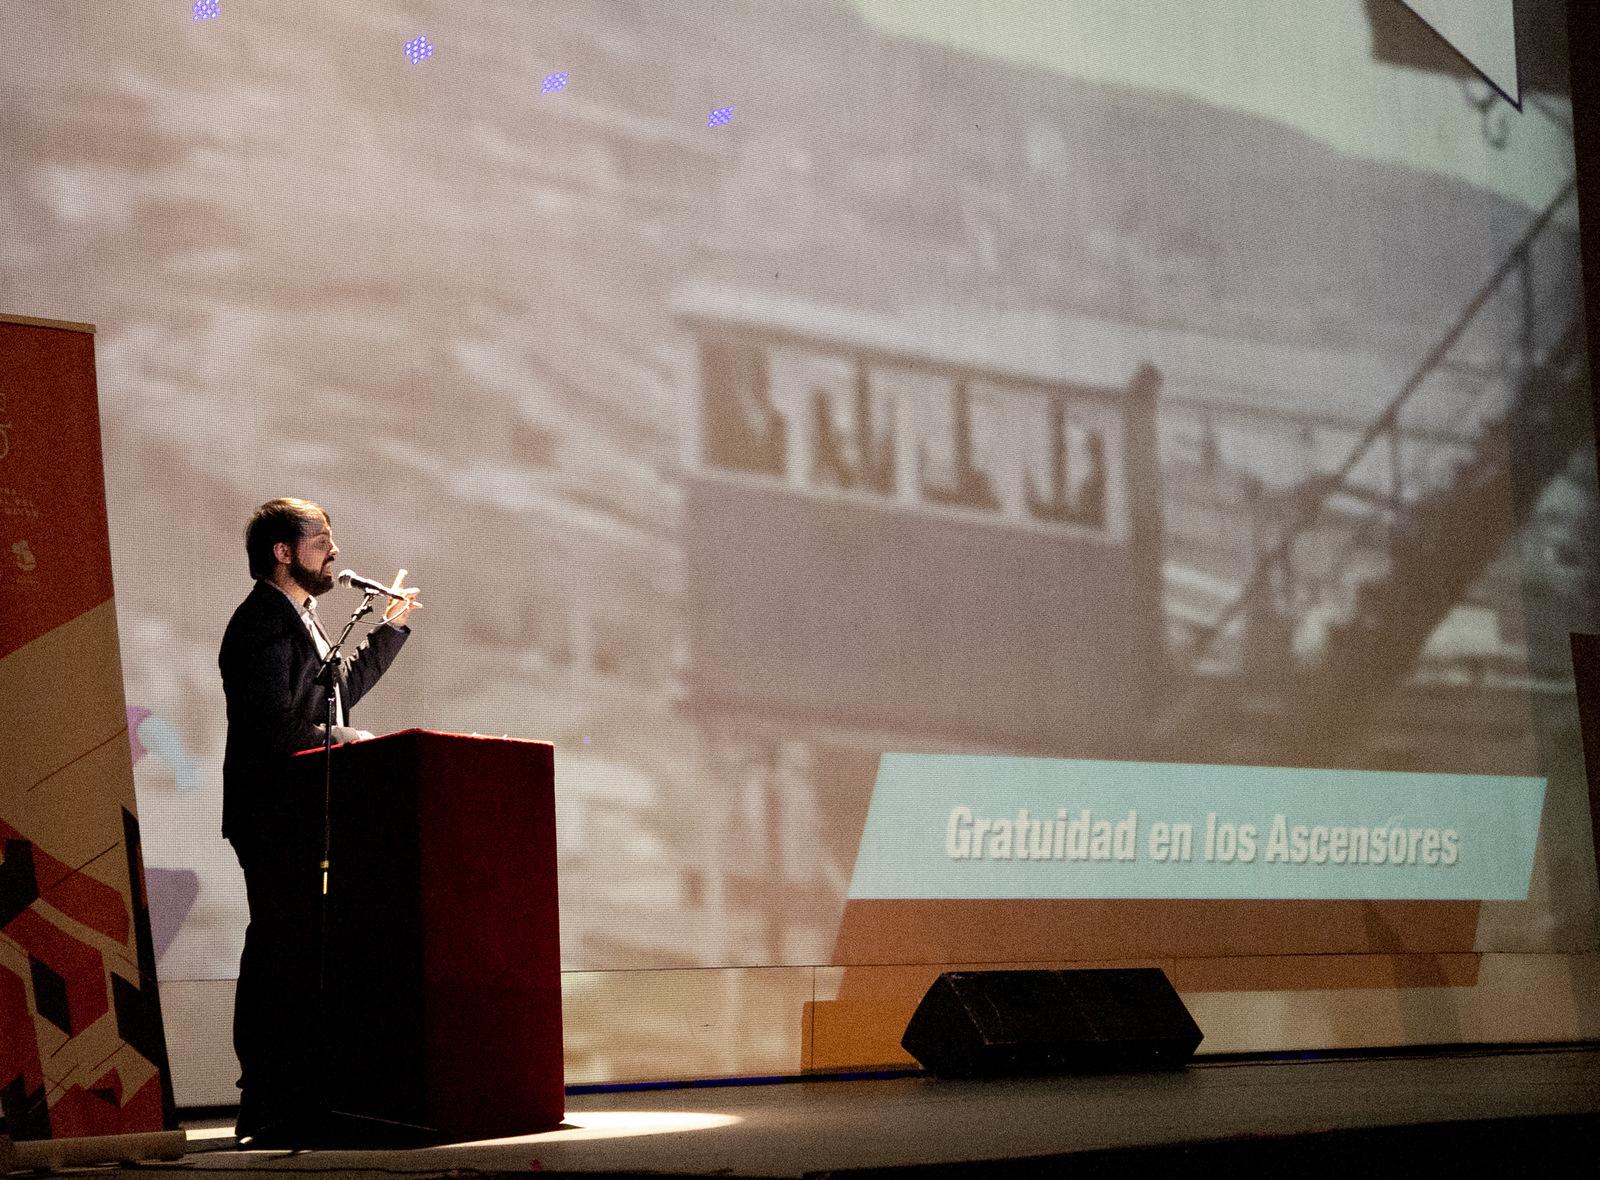 Valparaíso: Sharp anuncia que ascensores serán gratuitos para los adultos mayores